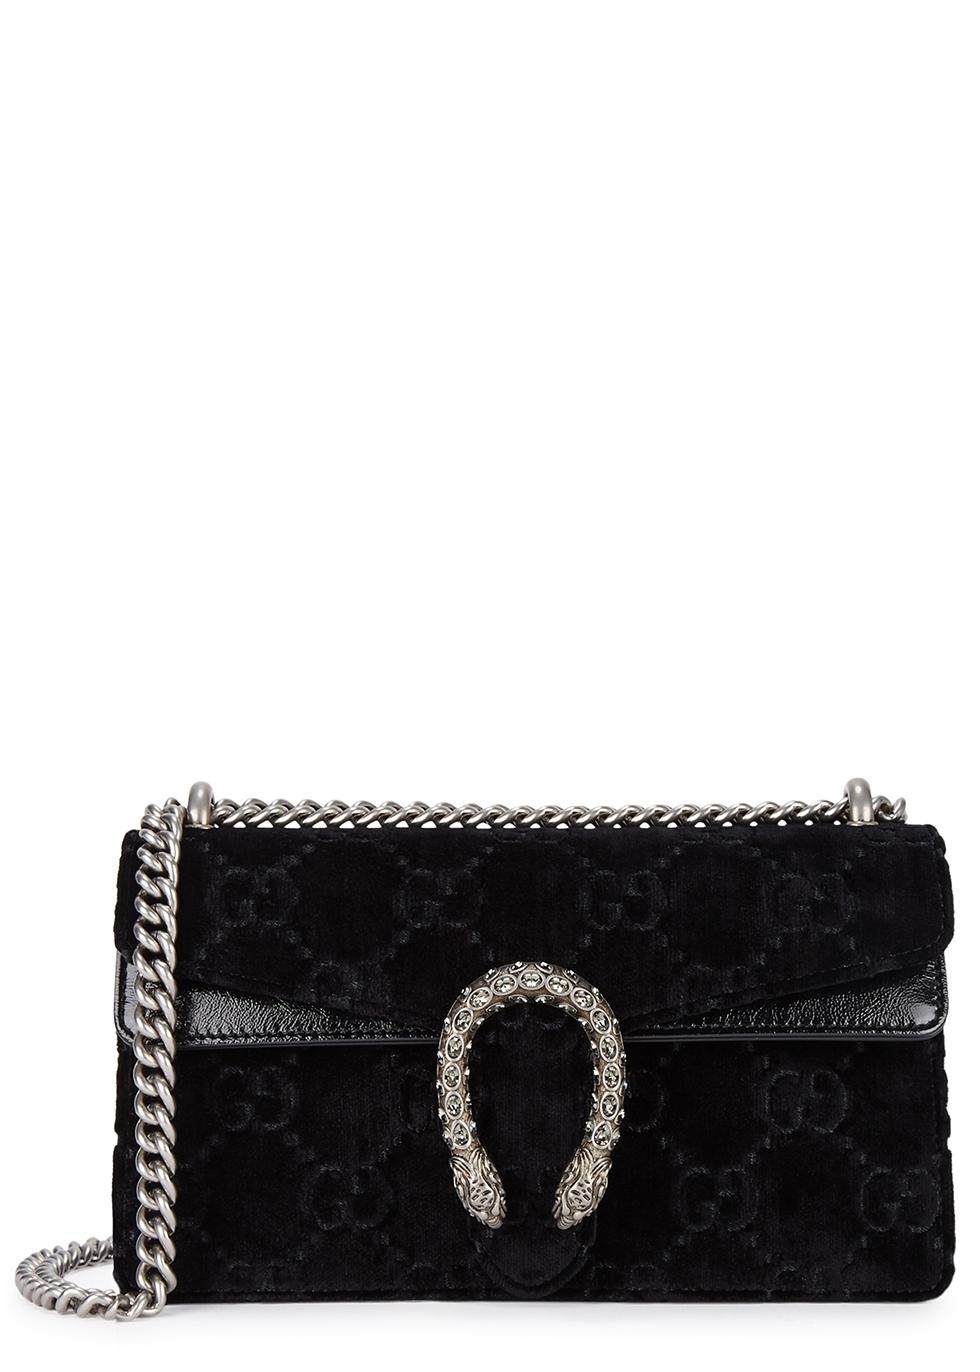 ad4243fd03e Gucci Bags - Womens - Harvey Nichols